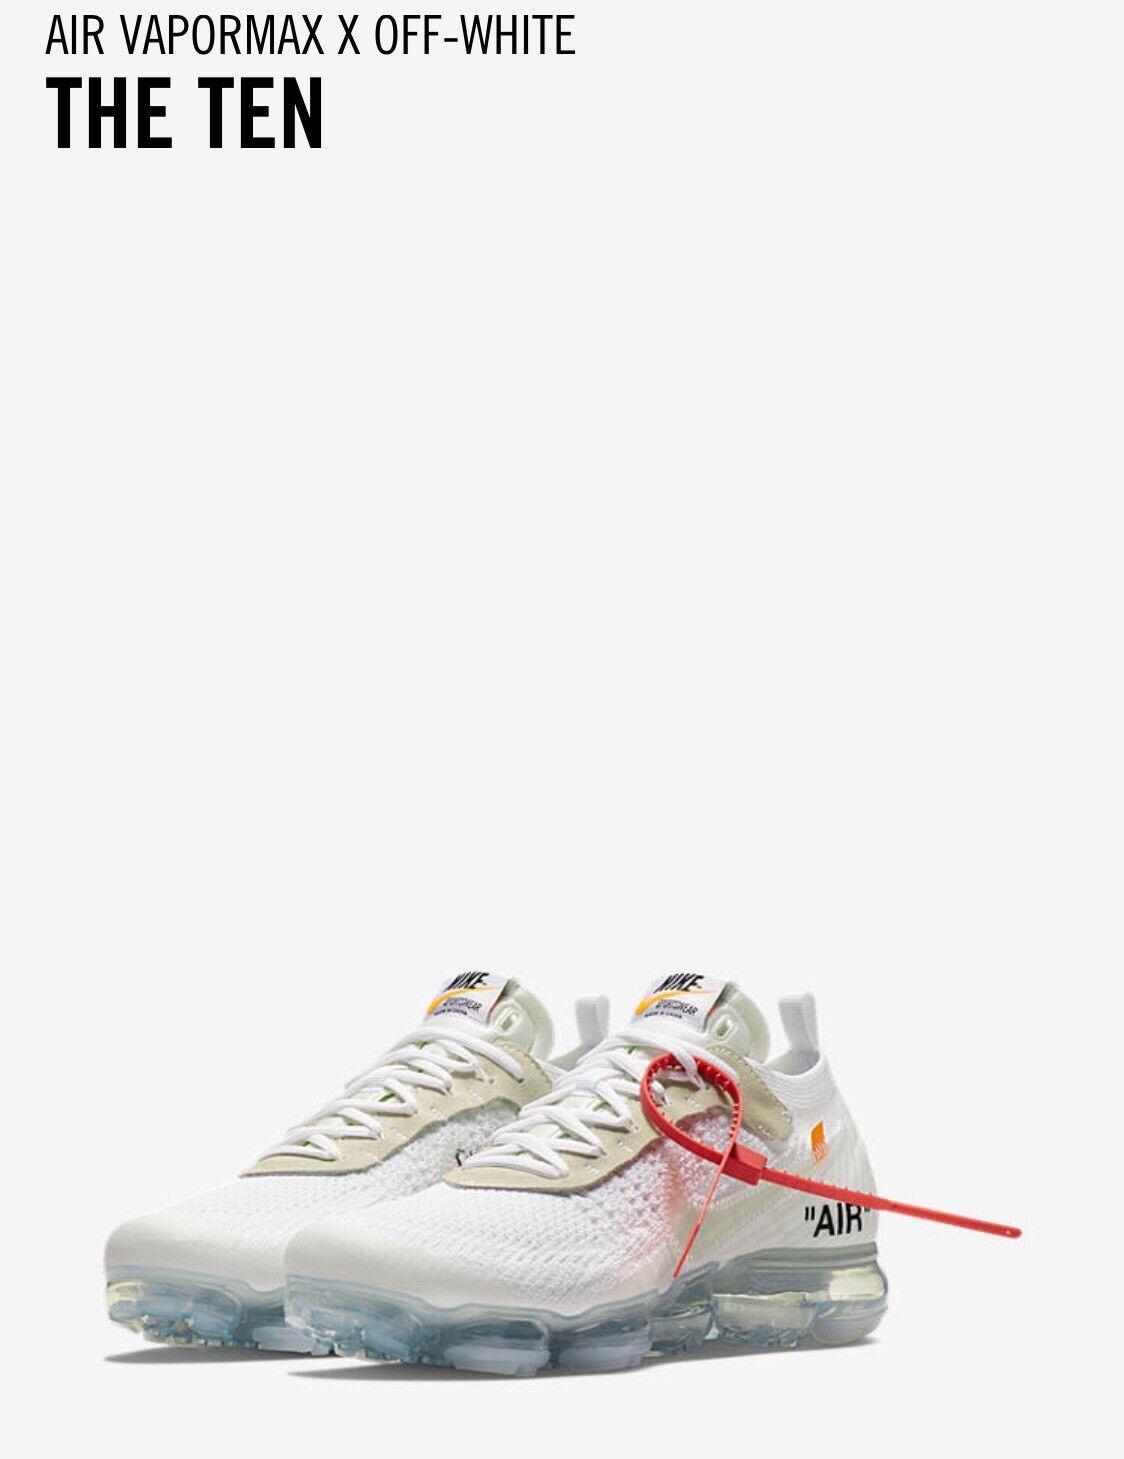 Nike Air Vapormax Flyknit x bianco sporco i dieci Da Uomo Taglia UK12  13 EU47.5